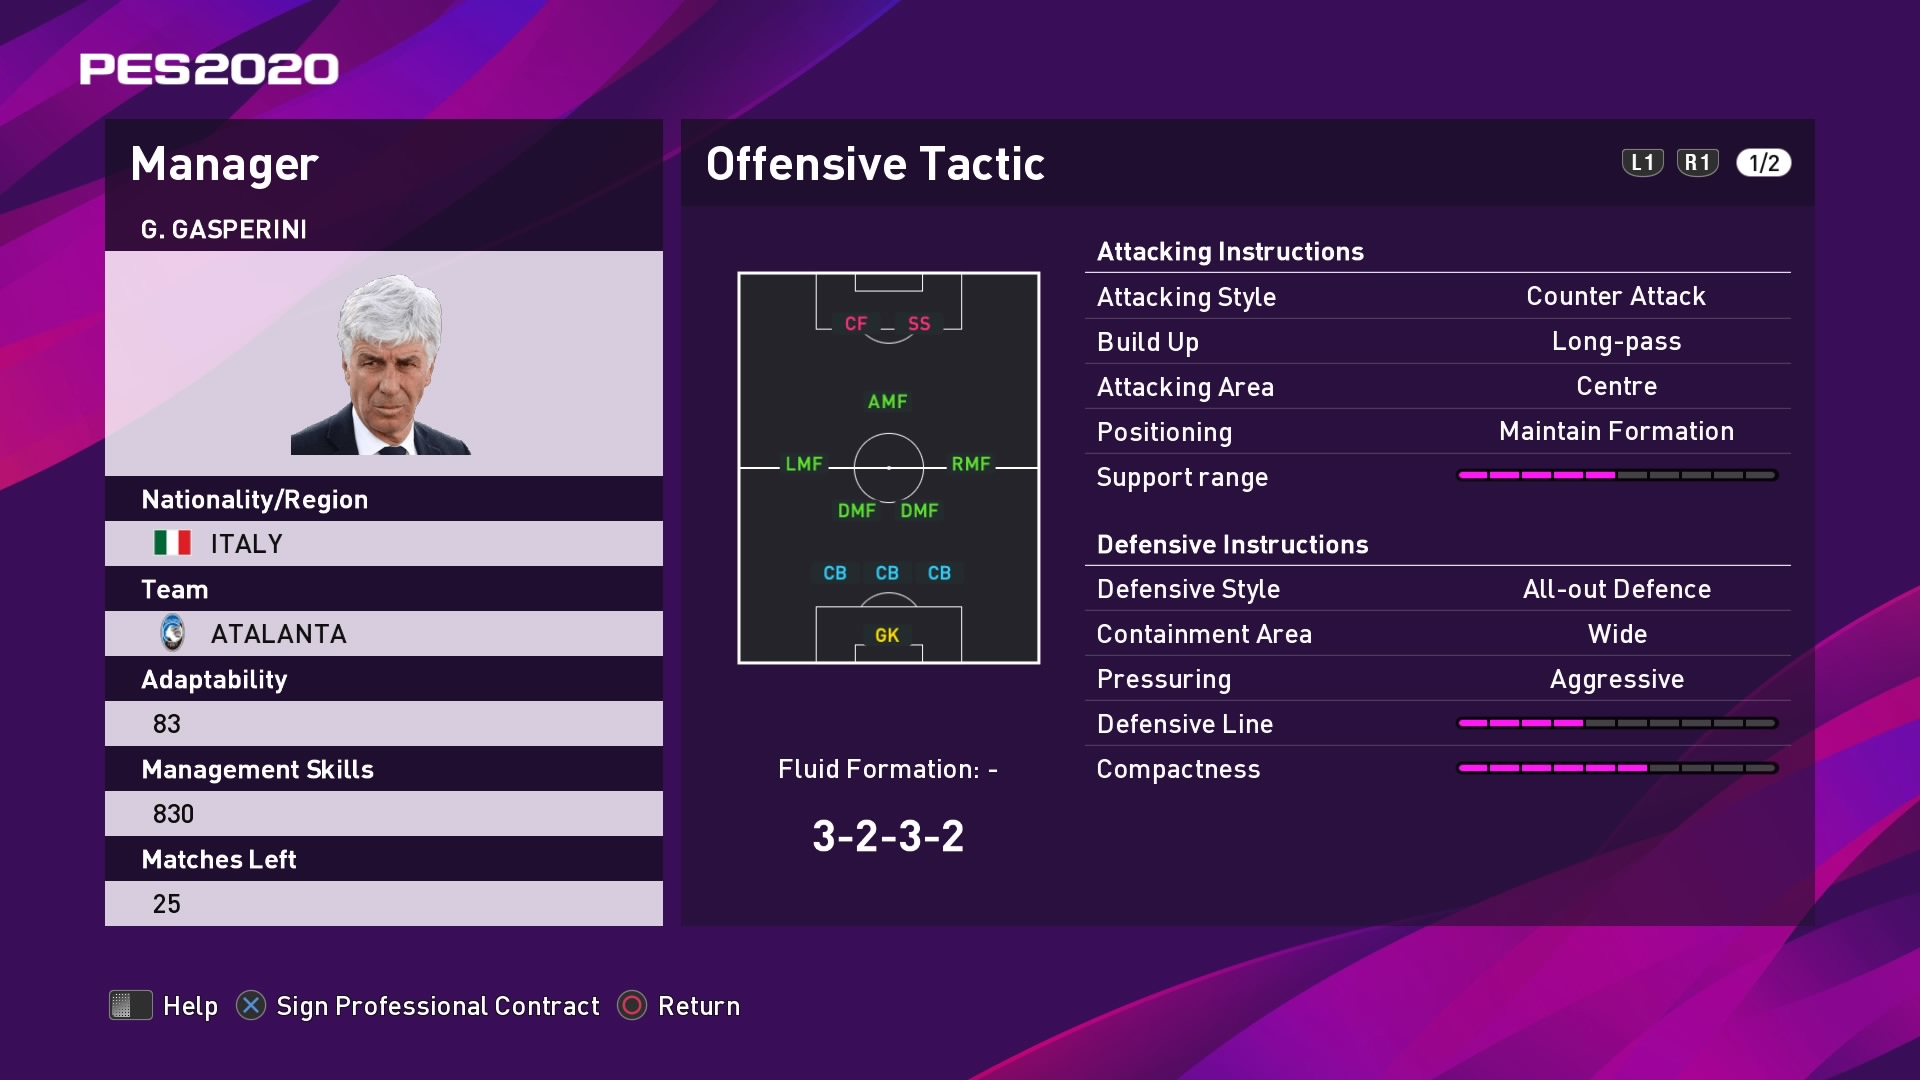 G. Gasperini (Gian Piero Gasperini) Offensive Tactic in PES 2020 myClub